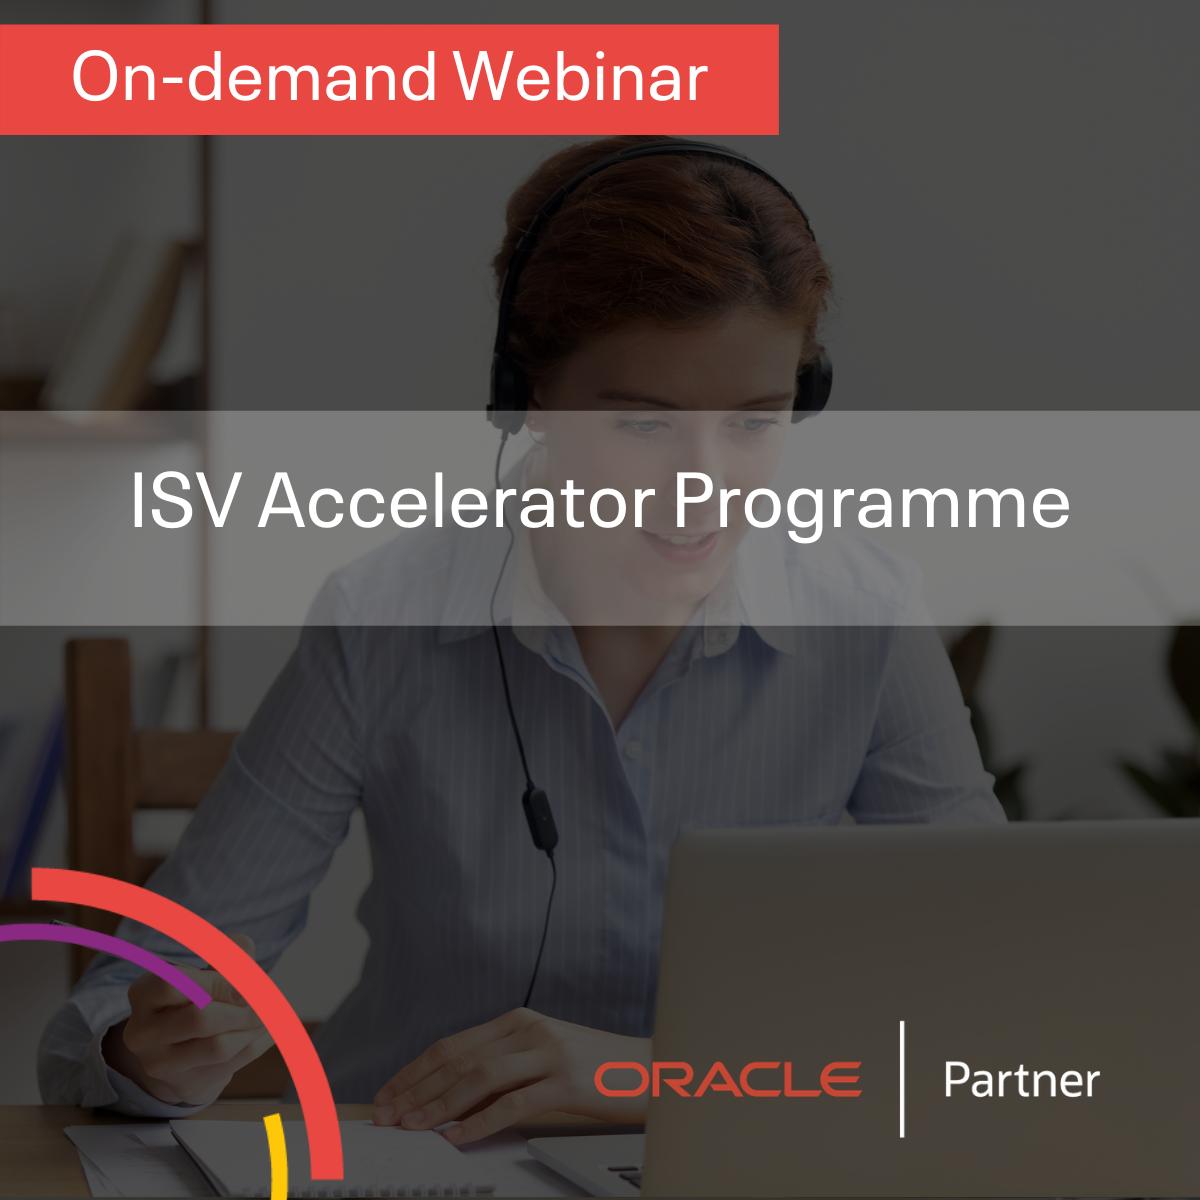 ISV Accelerator Programme